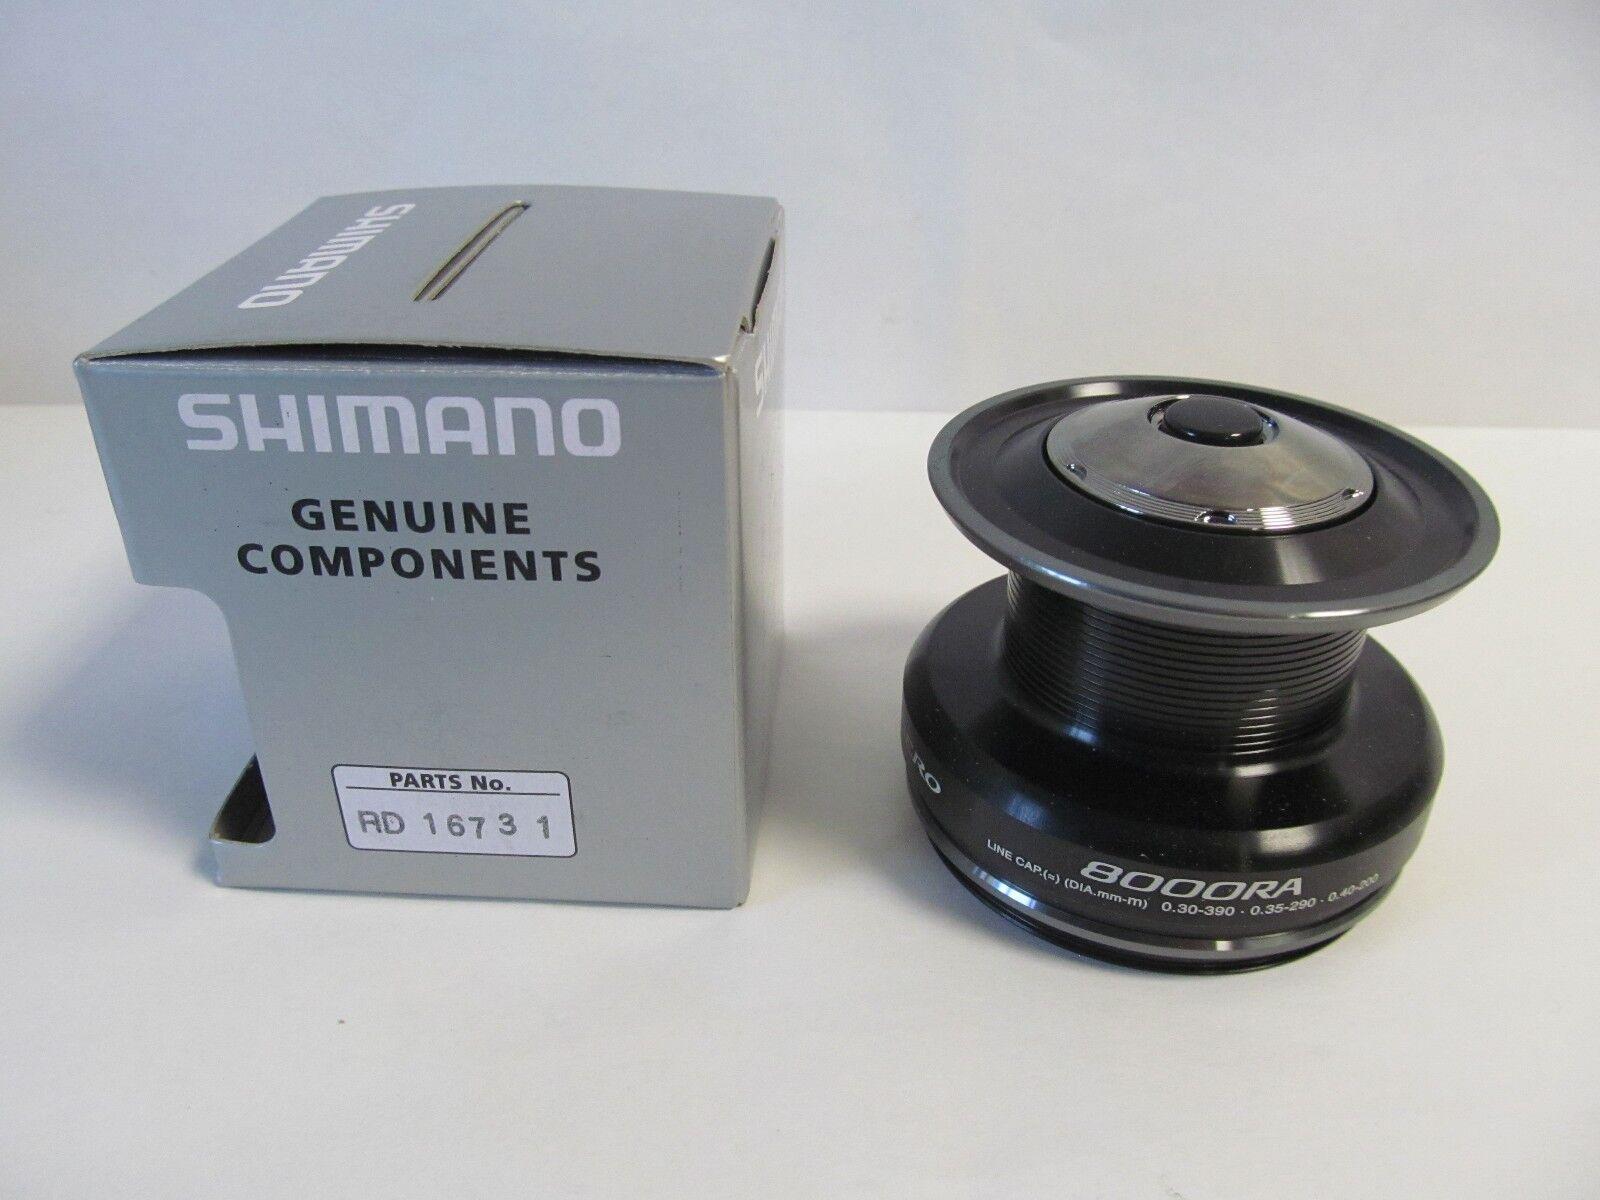 SHIMANO SPARE SPOOL BAITRUNNER X-AERO 8000 RA